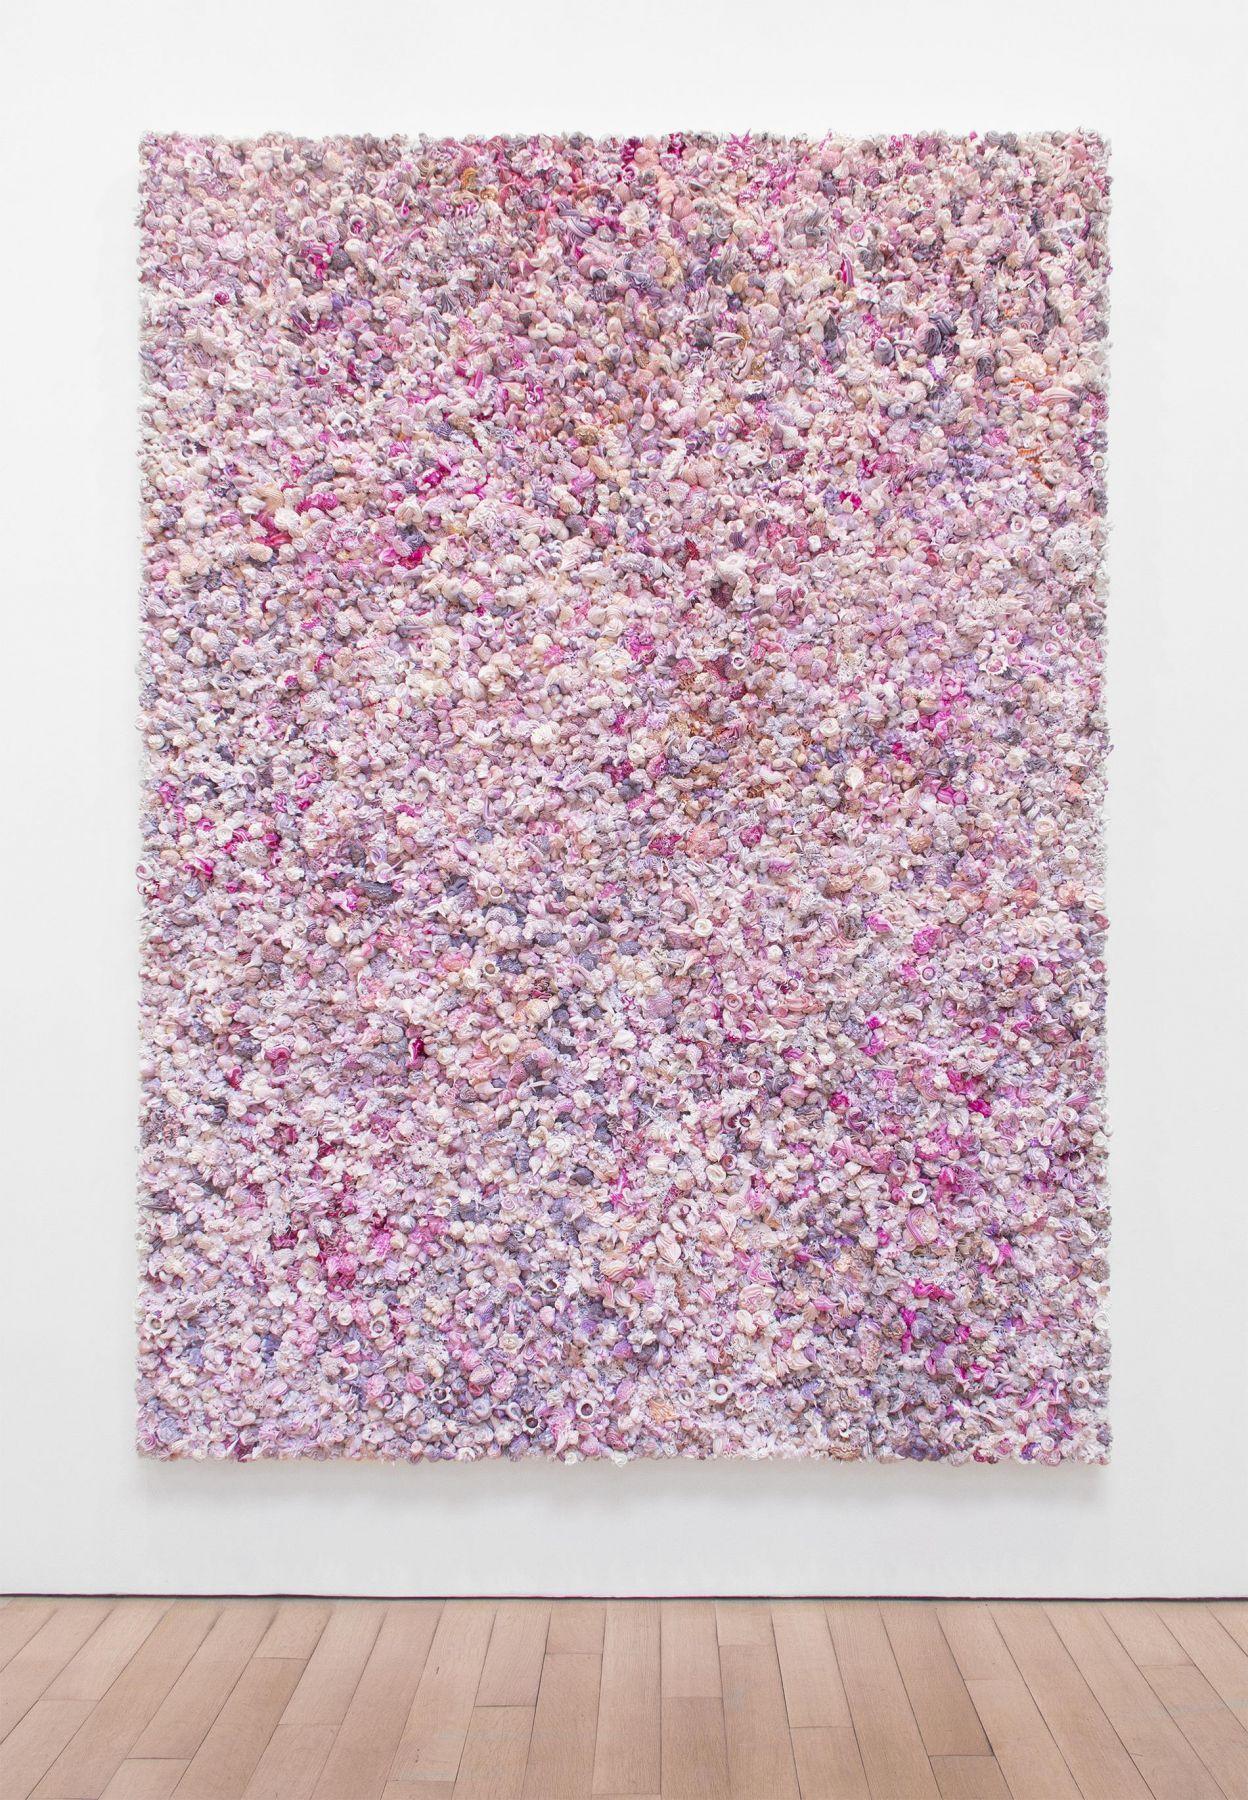 , Under Heaven -- 2808TV1412,2014,Oil on canvas, aluminum,90 3/8 x 70 3/4 x 5 1/2 in.